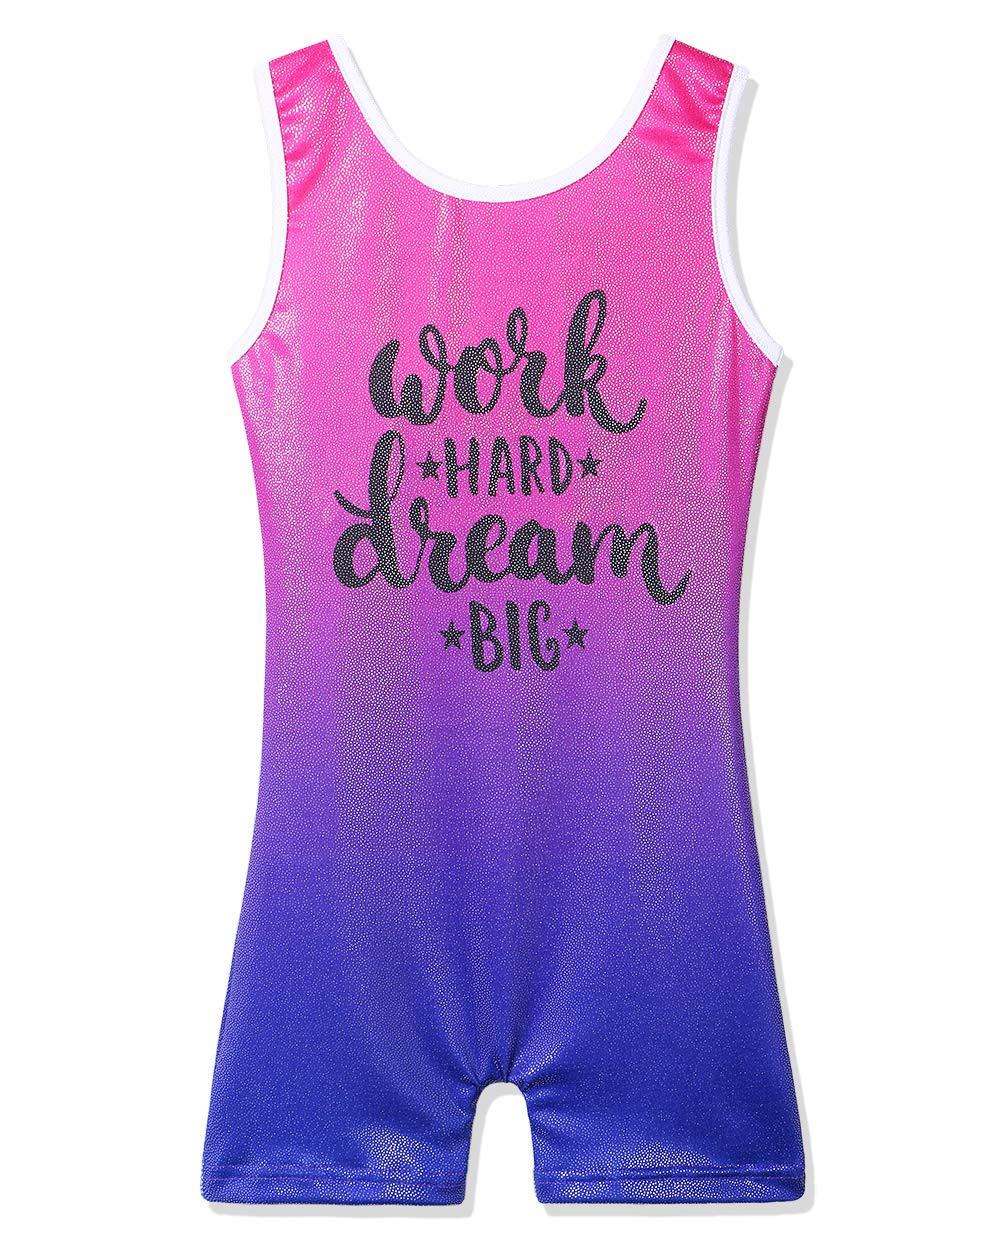 BAOHULU Leotard for Girls Gymnastics Kids Sparkle Tank Biketards with Shorts Dance Outfit